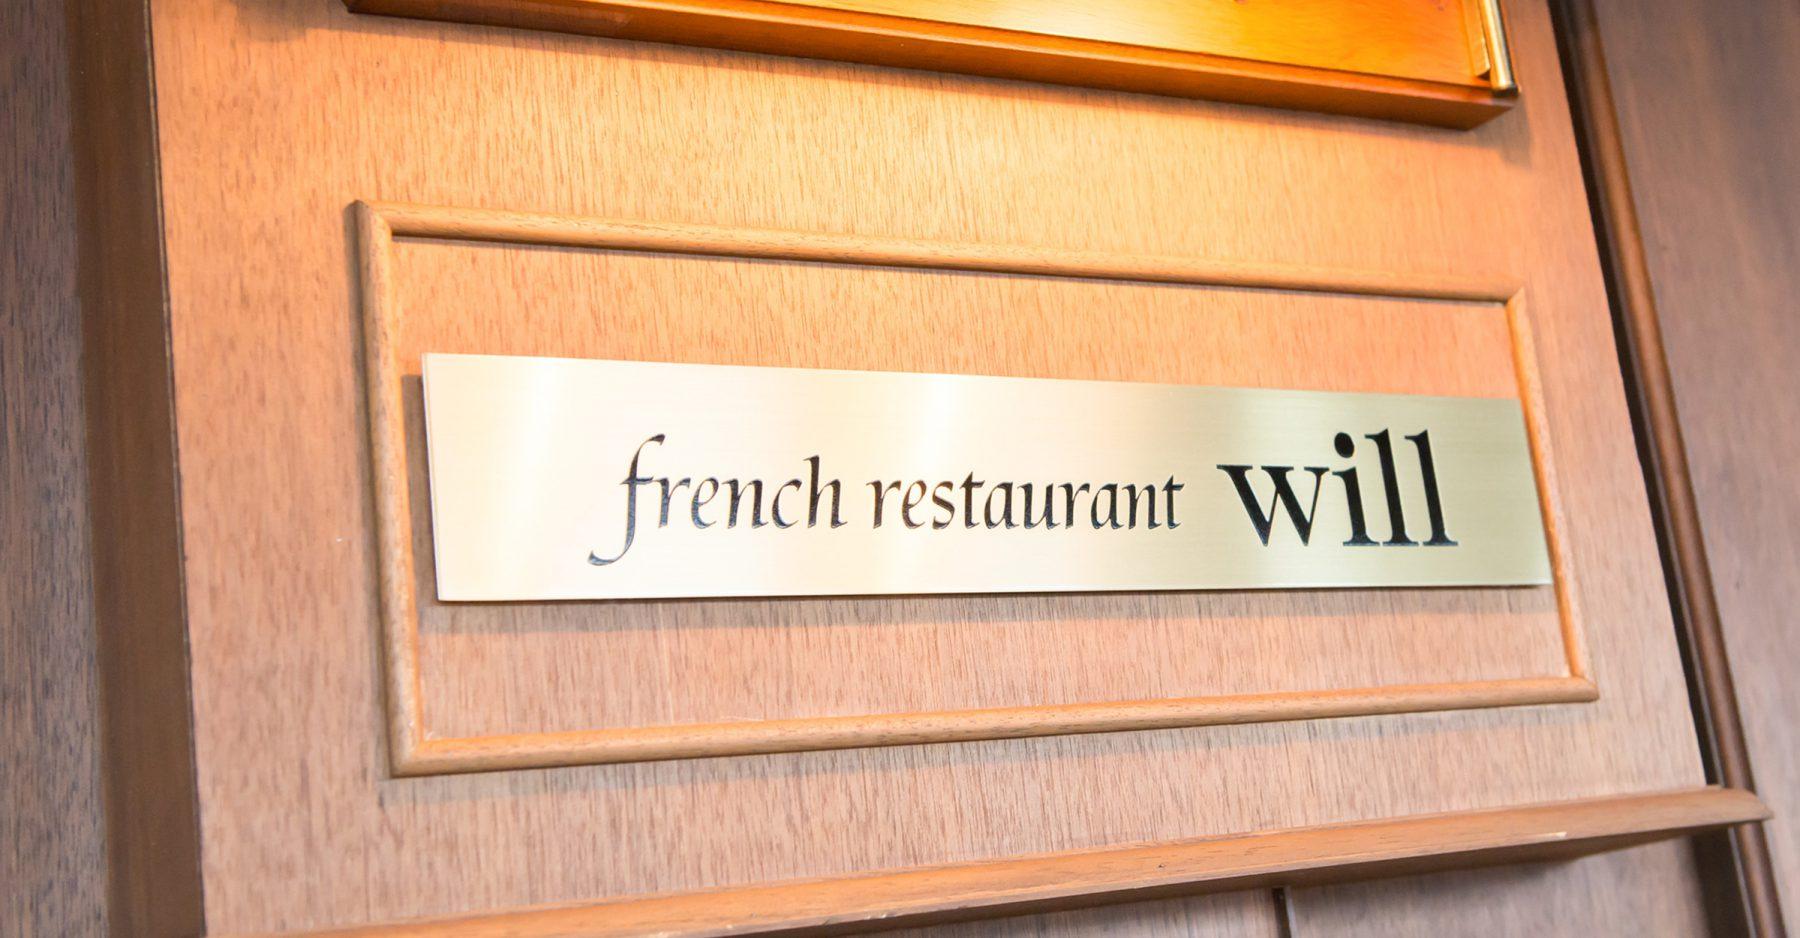 french restaurant willの写真